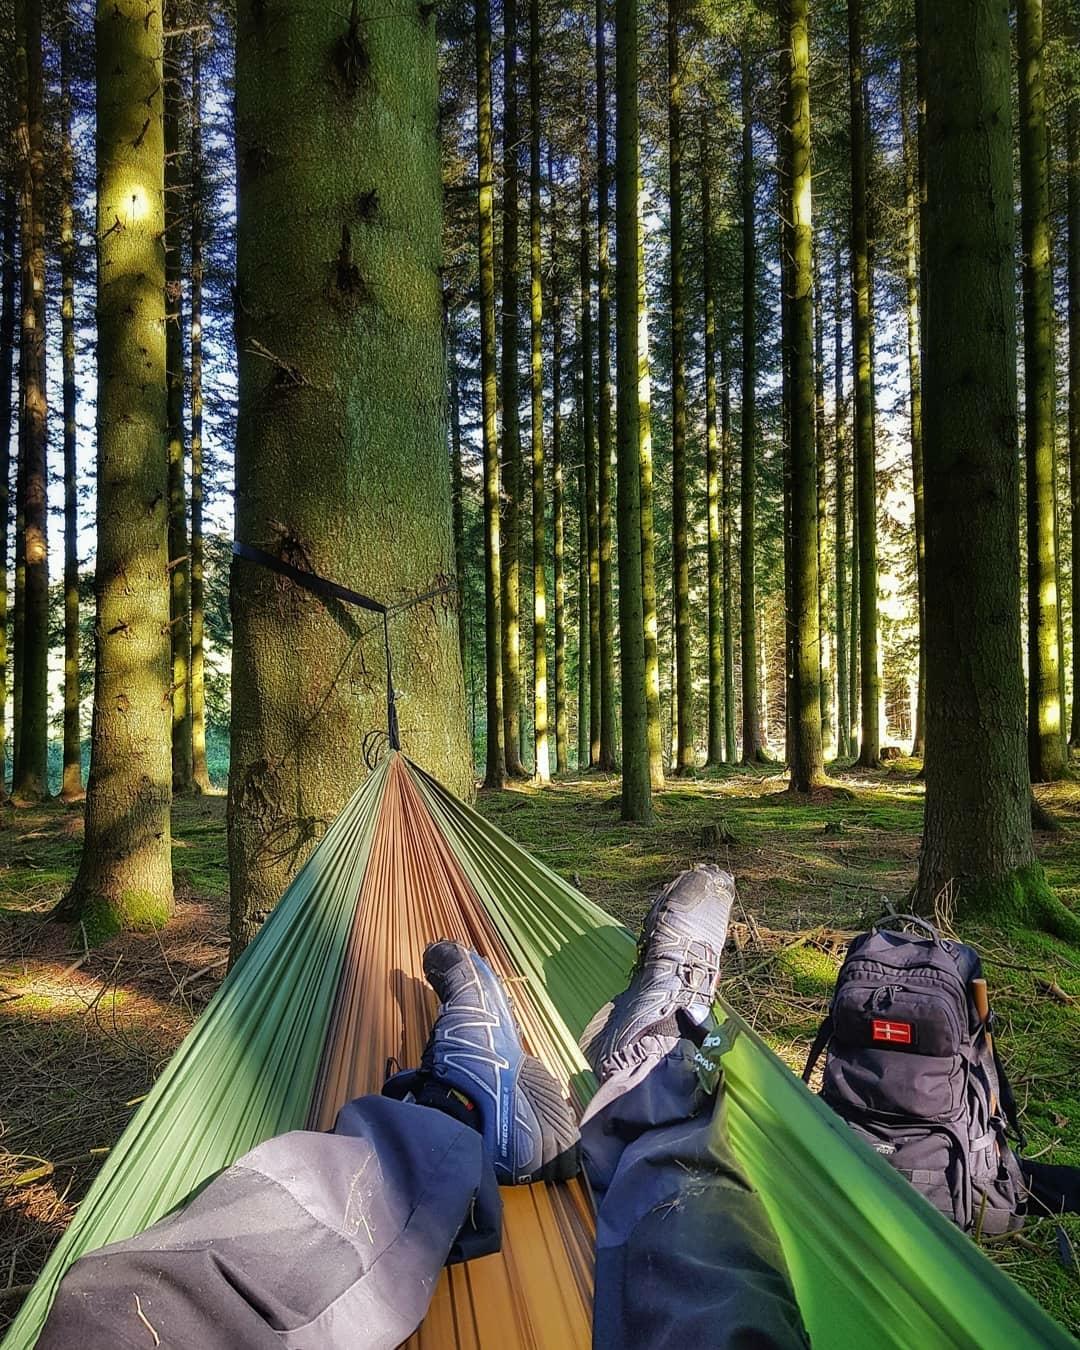 man relaxing on hammock in forest